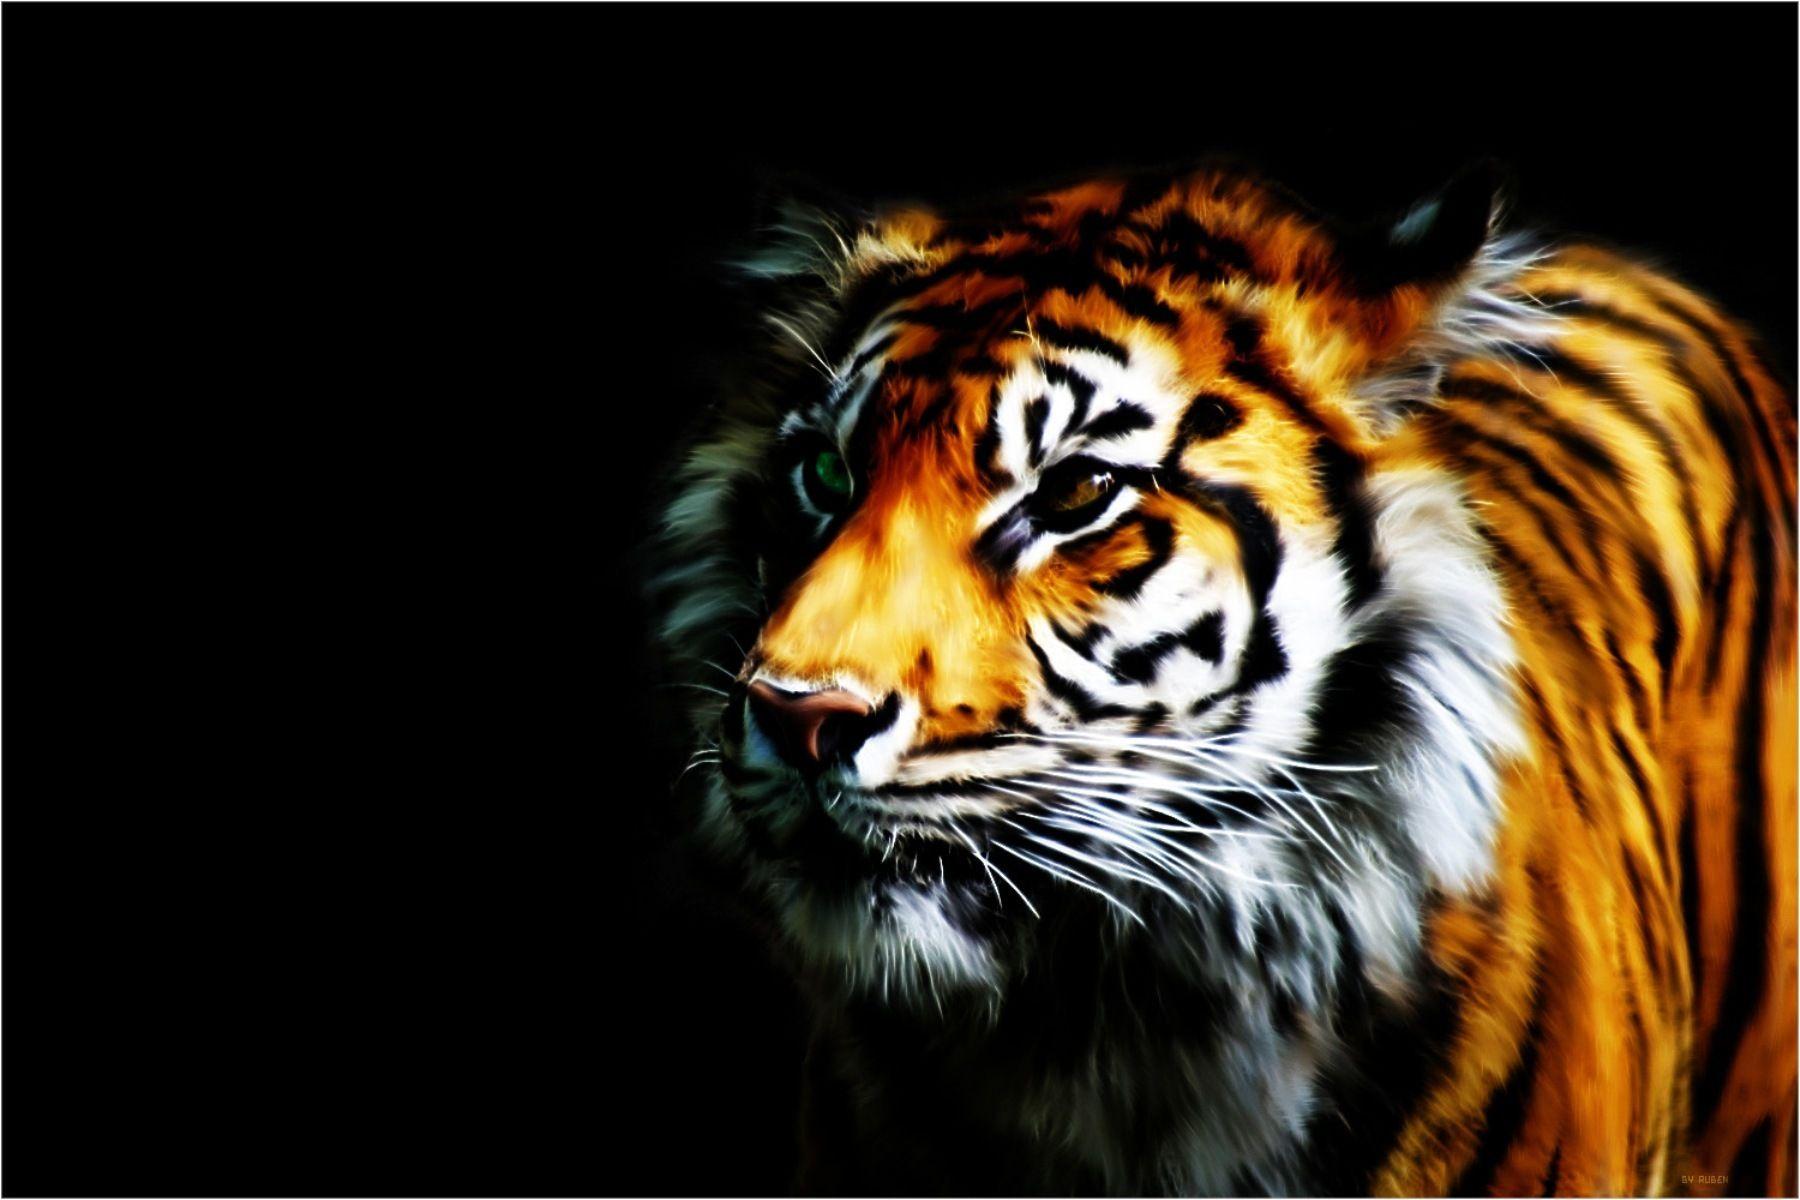 Cool Tiger HD Wallpaper